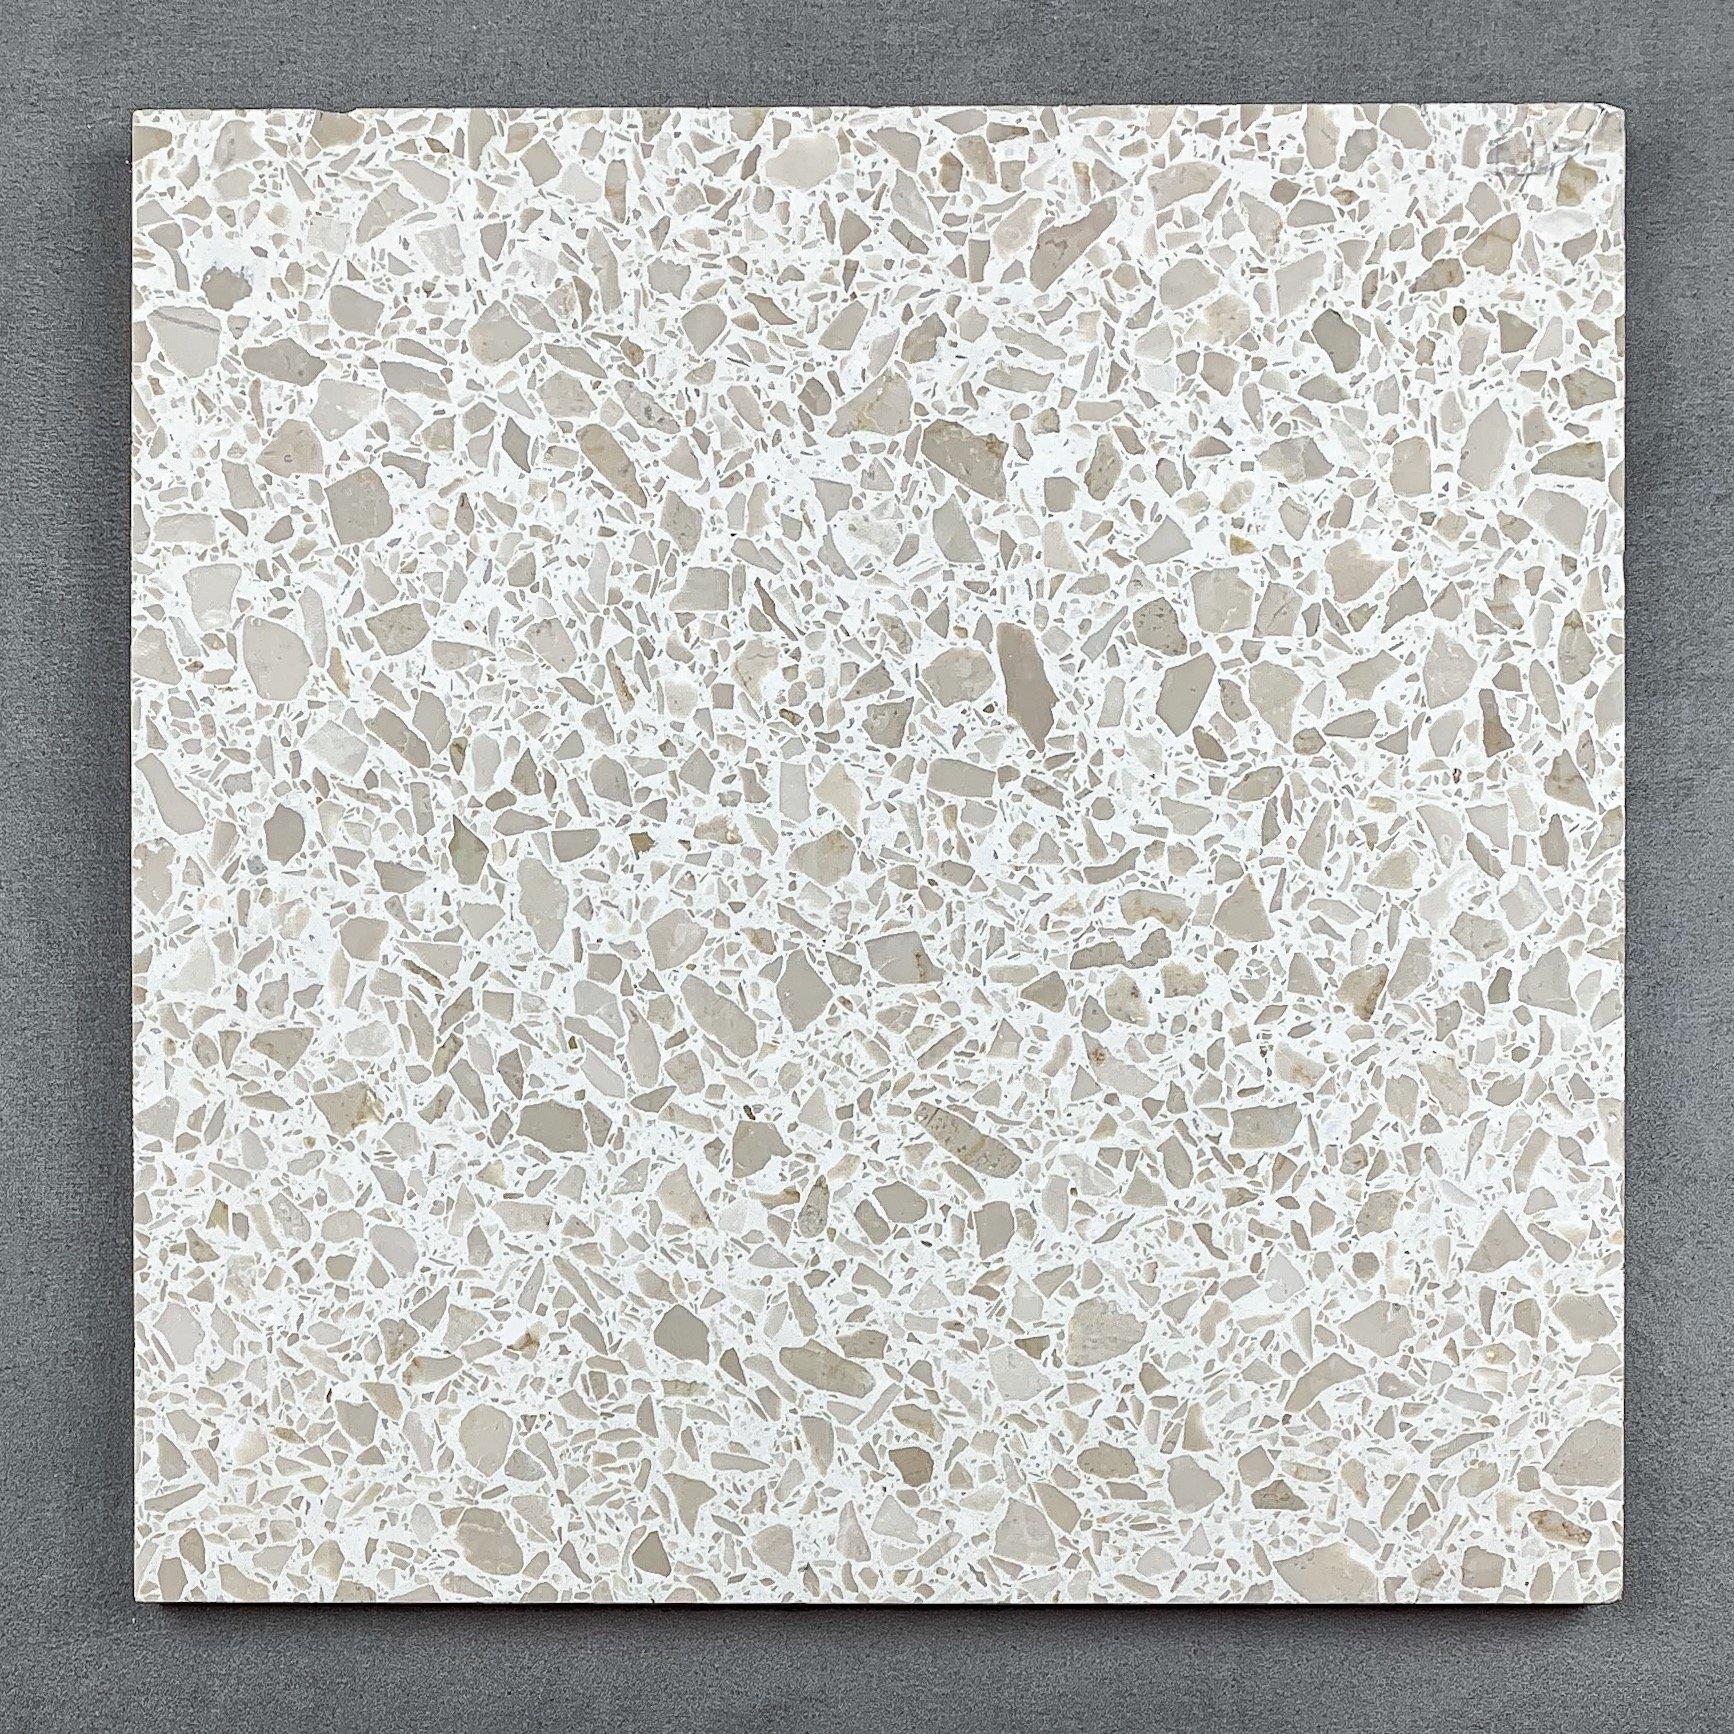 Praso 15mm Terrazzo Essential Tiles